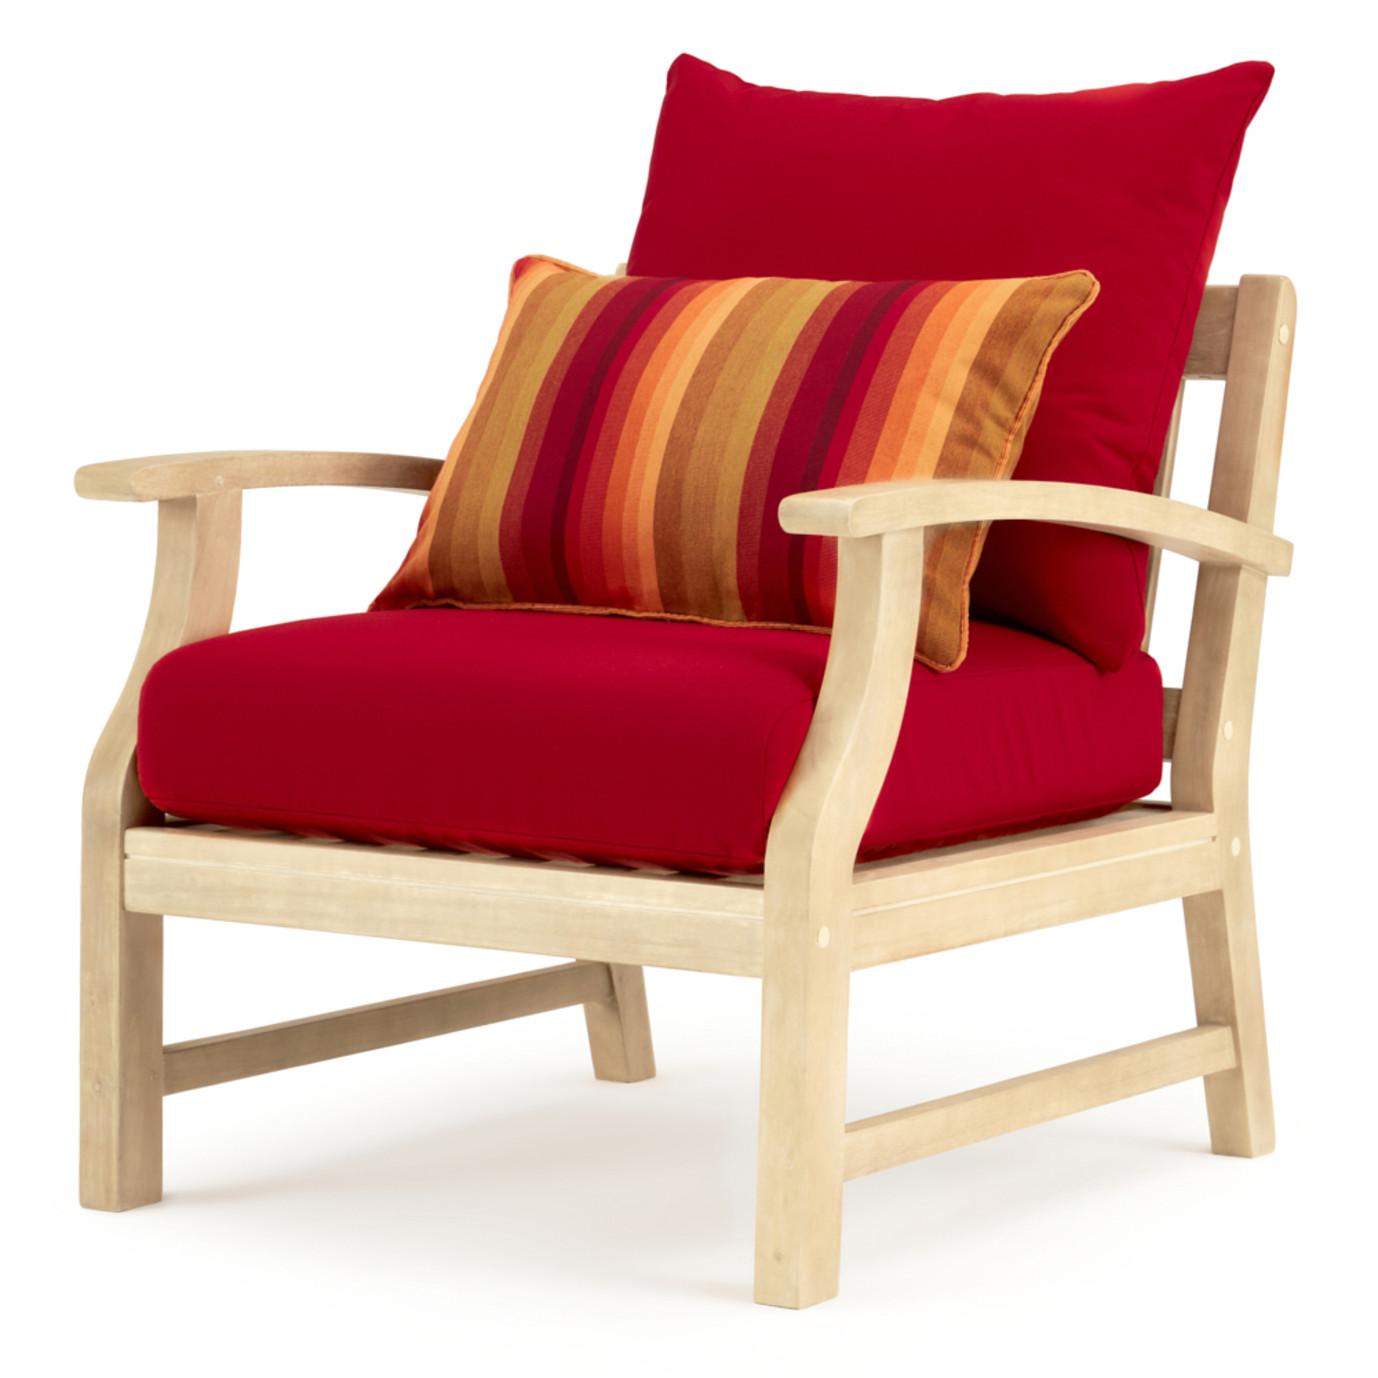 Kooper™ 7 Piece Outdoor Sofa & Club Chair Set - Sunset Red